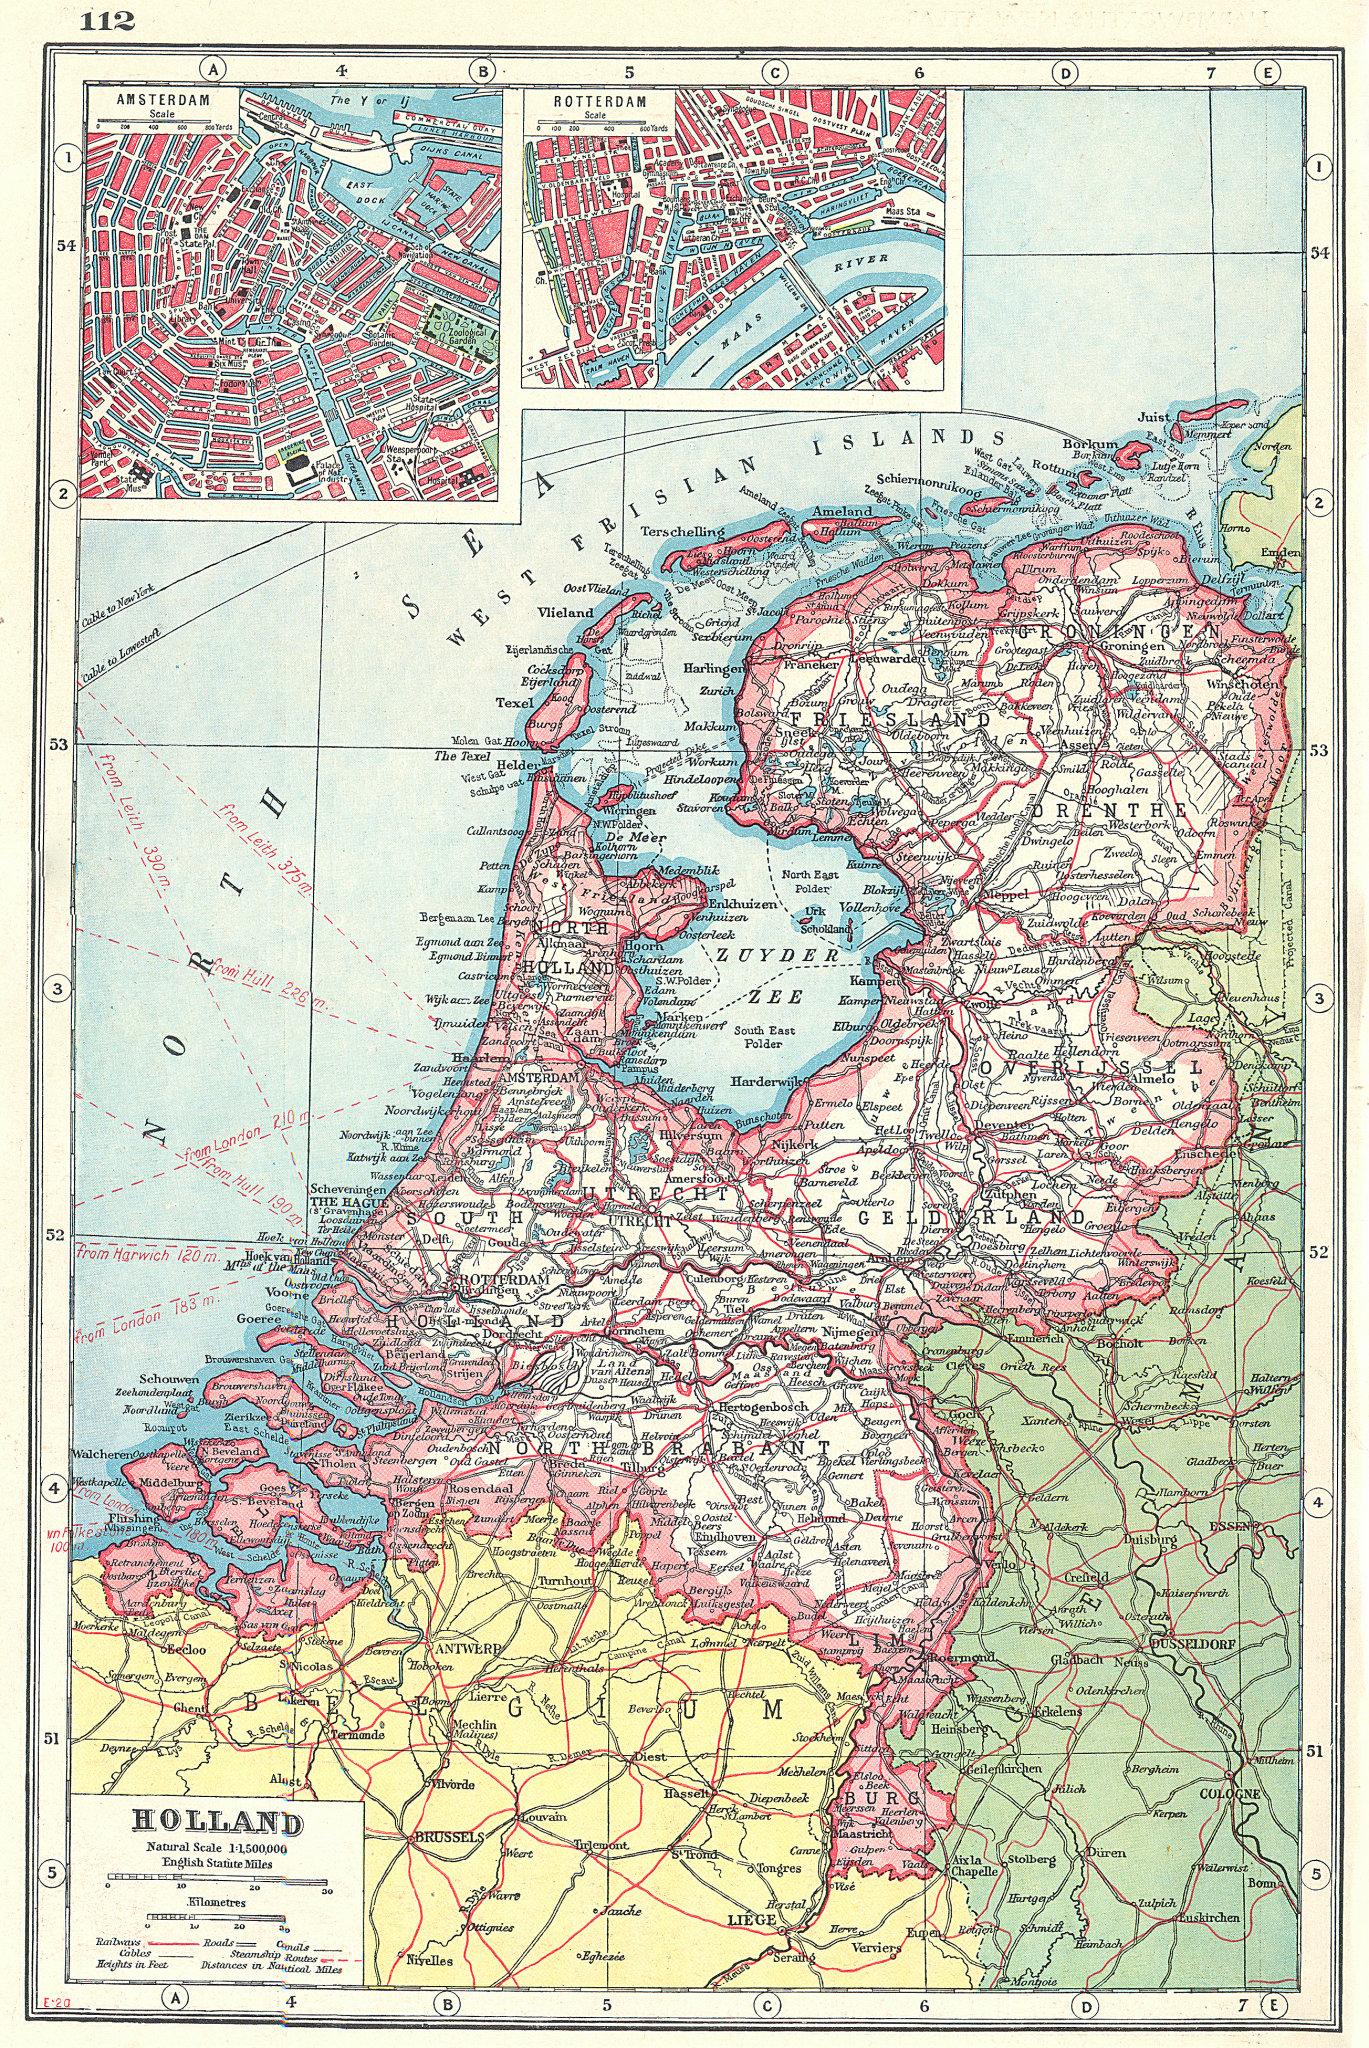 Associate Product NETHERLANDS. Holland.Railways canals.Inset Amsterdam & Rotterdam plans 1920 map